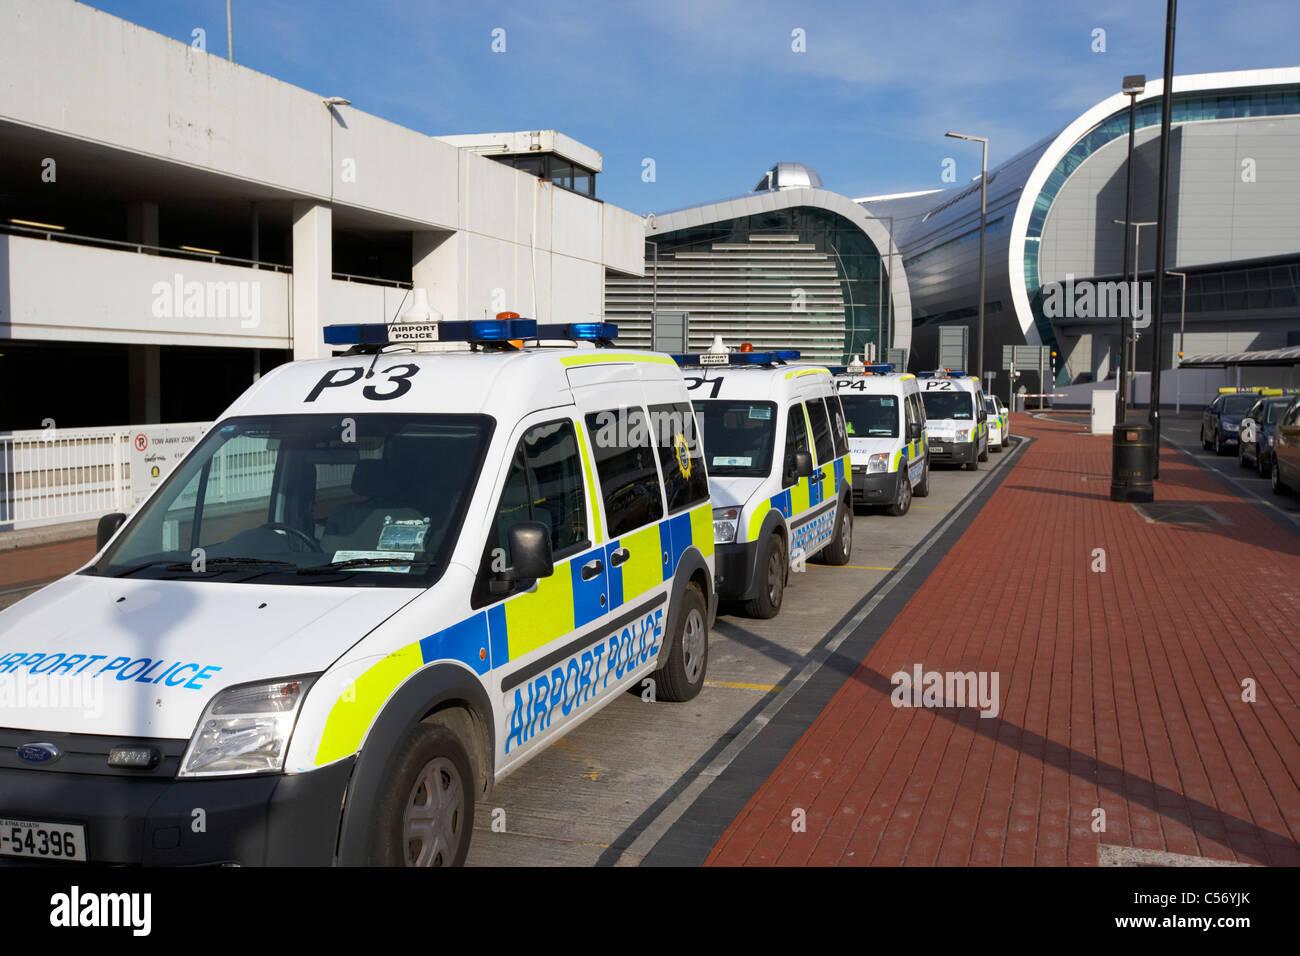 62e7cdbb2e rows of airport police vehicles dublin airport republic of ireland europe